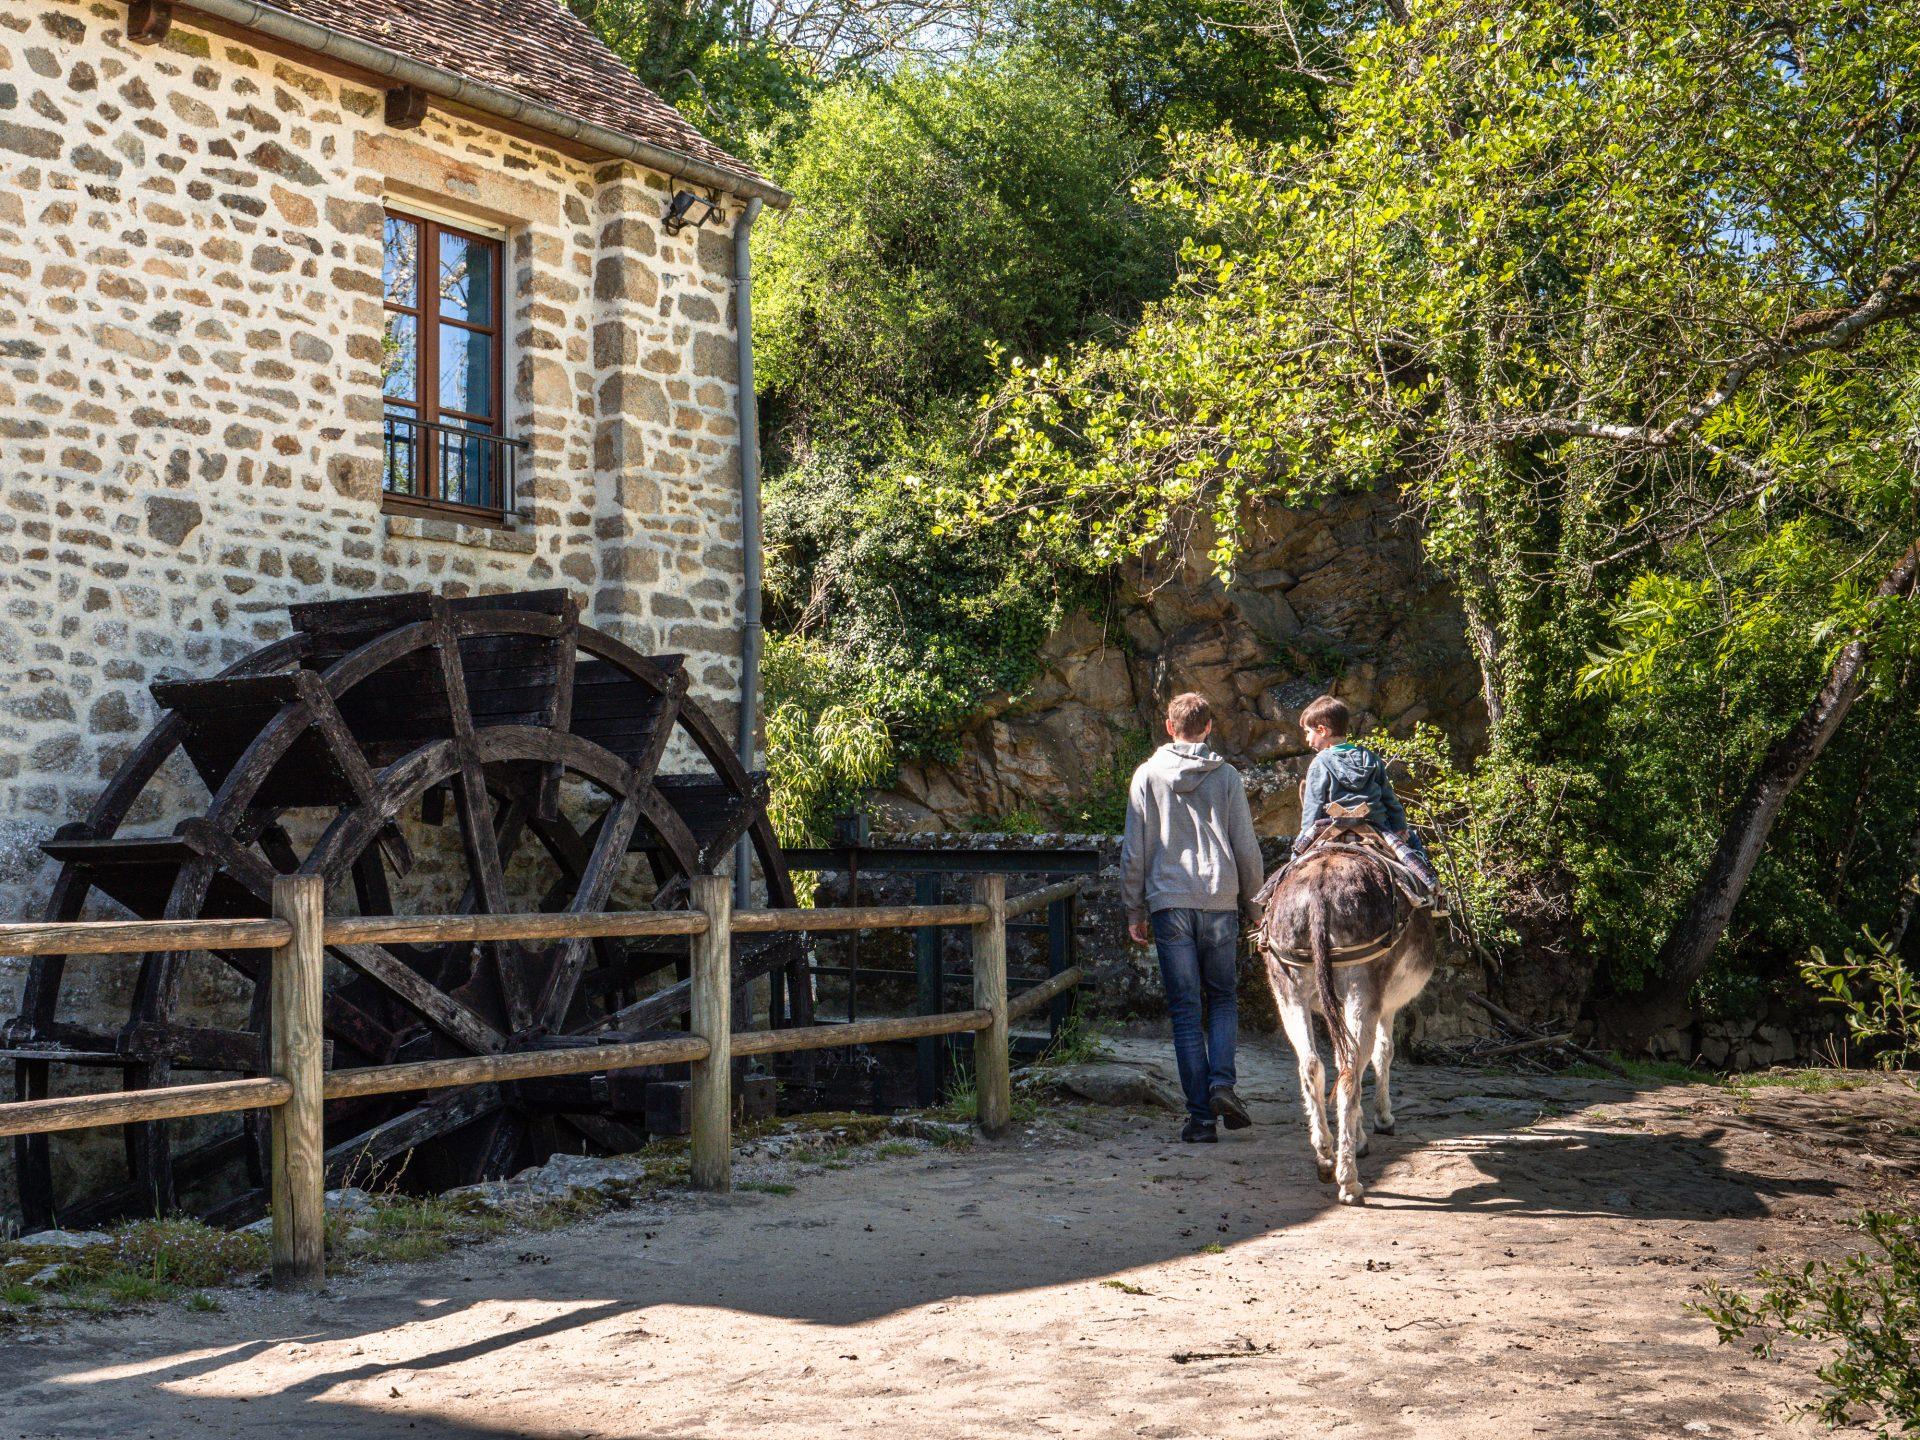 ane moulin 54496 - Les globe blogueurs - blog voyage nature